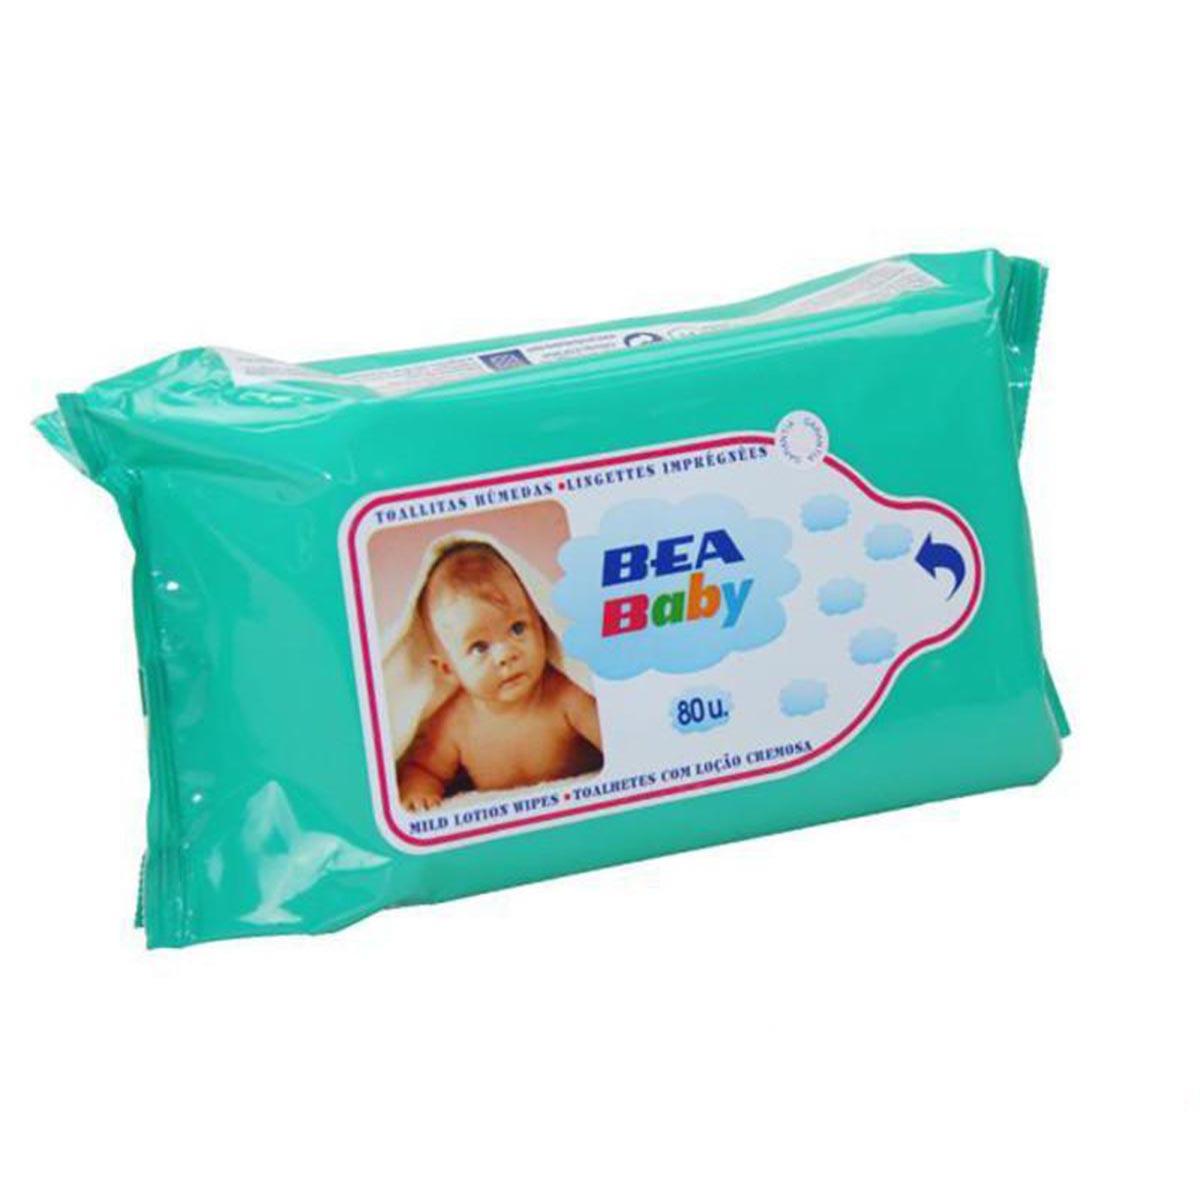 Lea Bea Baby Lingettes Pack 80 Unites